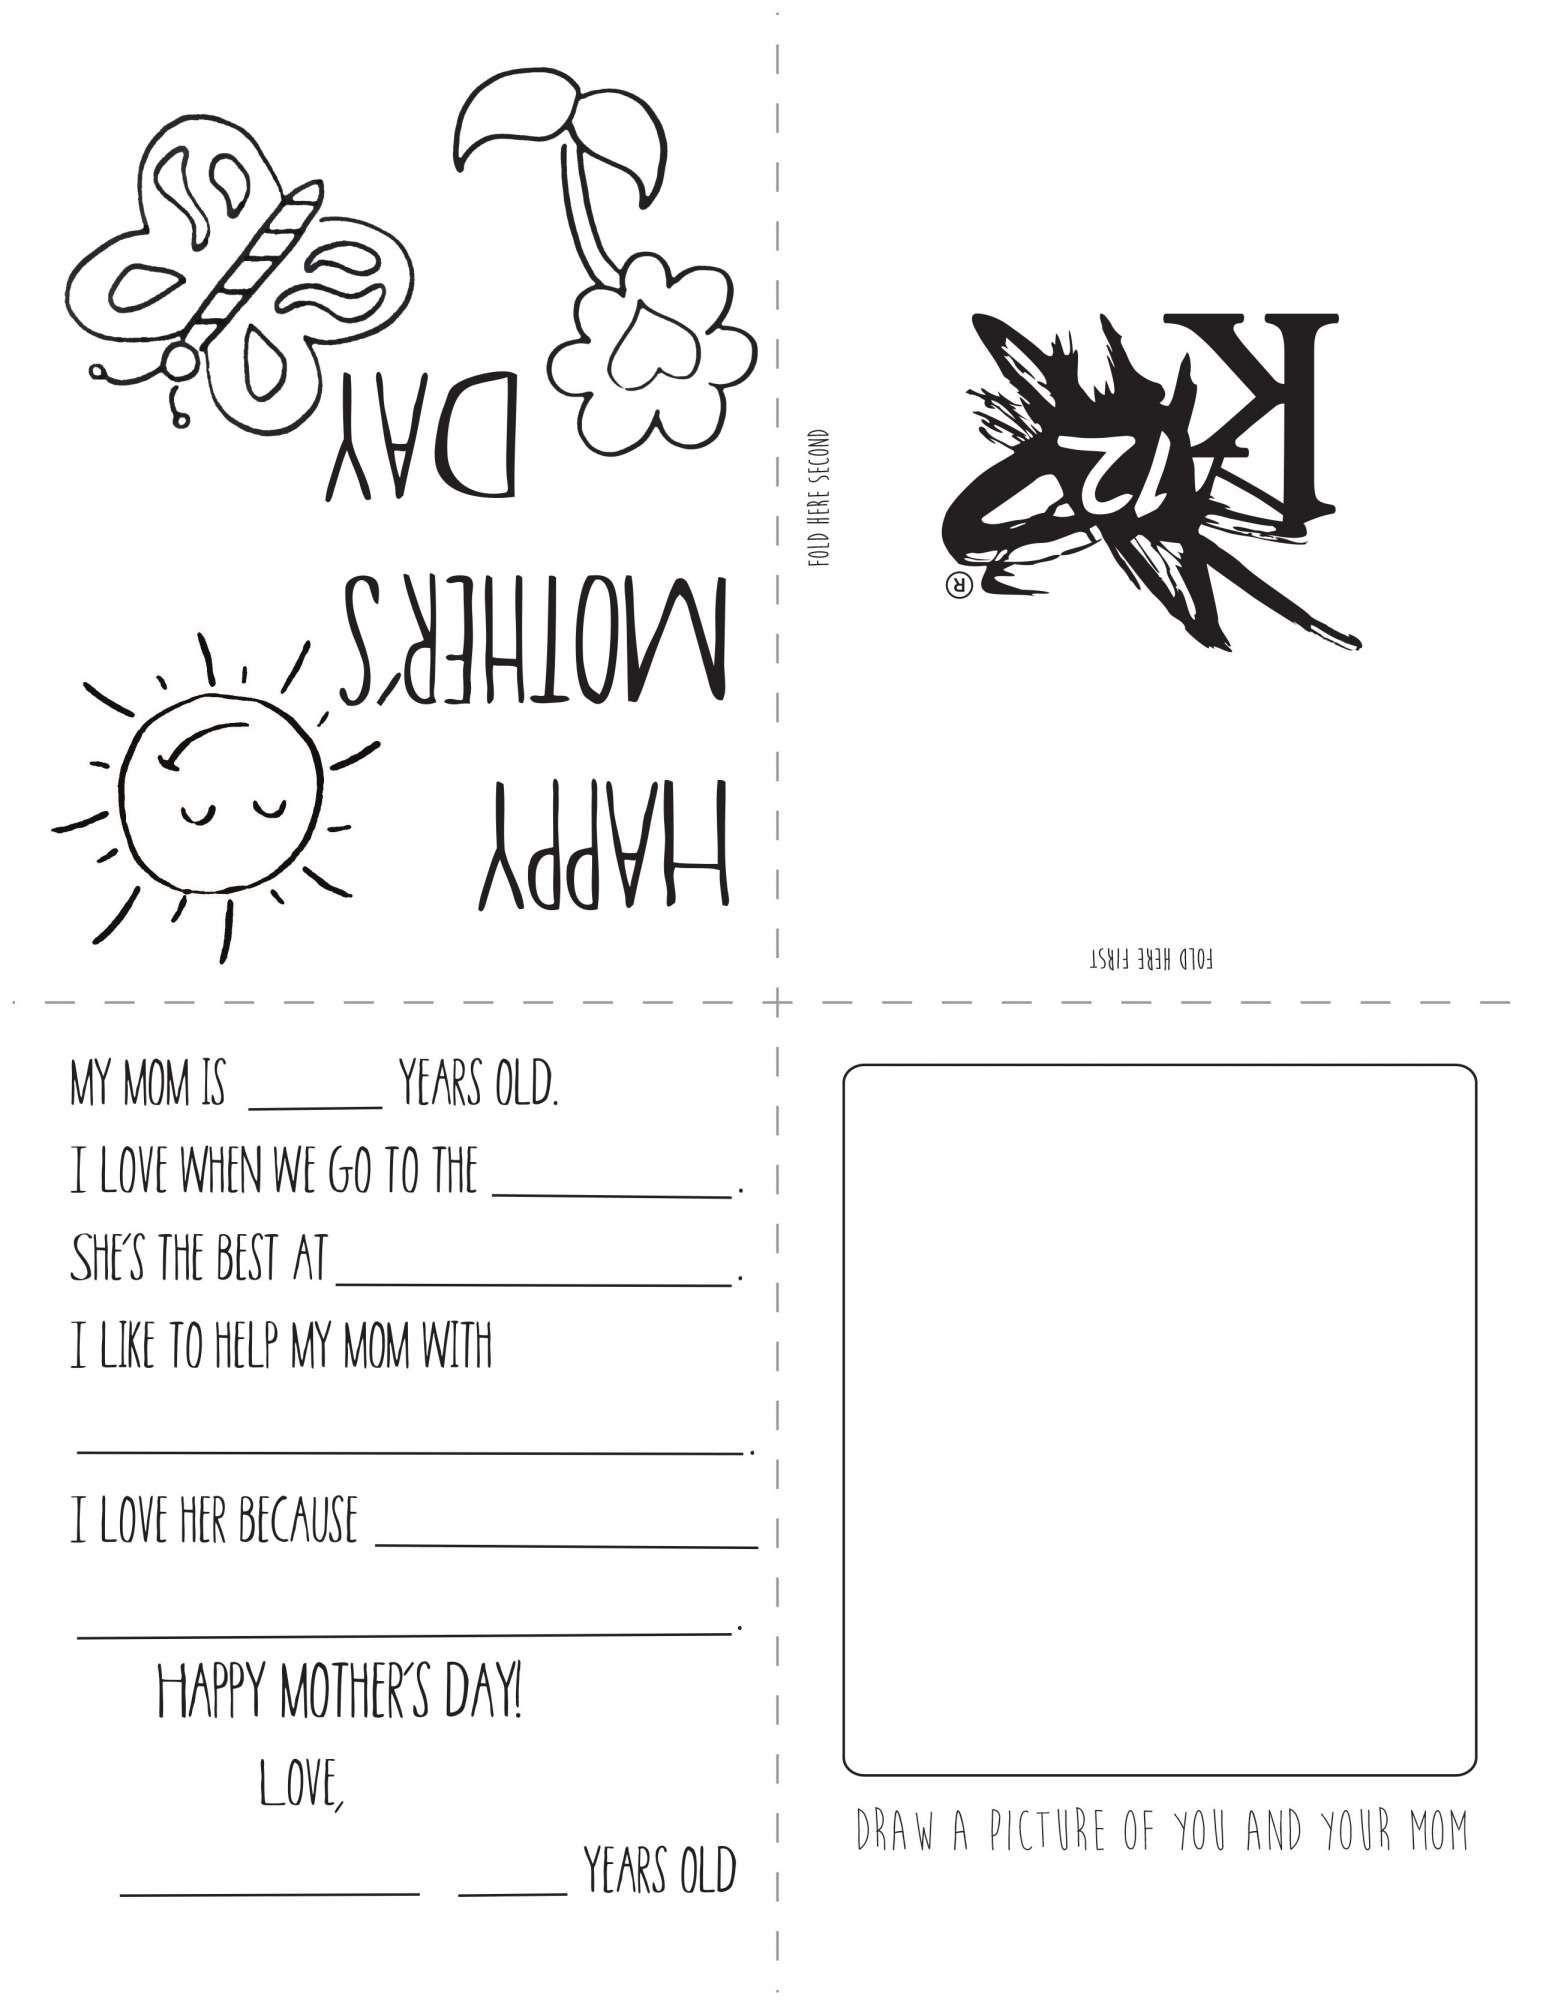 7 Mothers Day Worksheet Preschool Preschool Printable Sheets Com Mothers Day Card Template Mother S Day Printables Mothers Day Coloring Cards